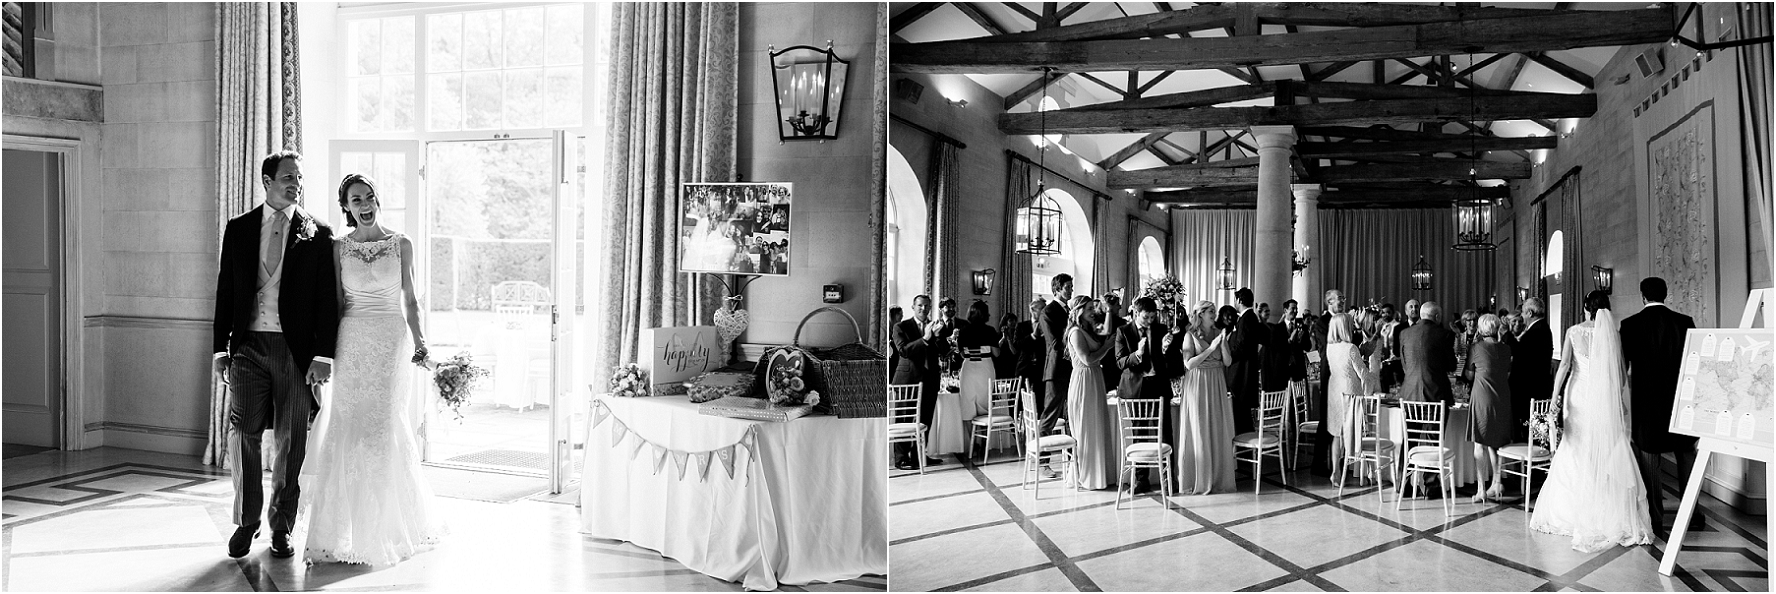 Wedding Photography The Orangery Settringham_0269